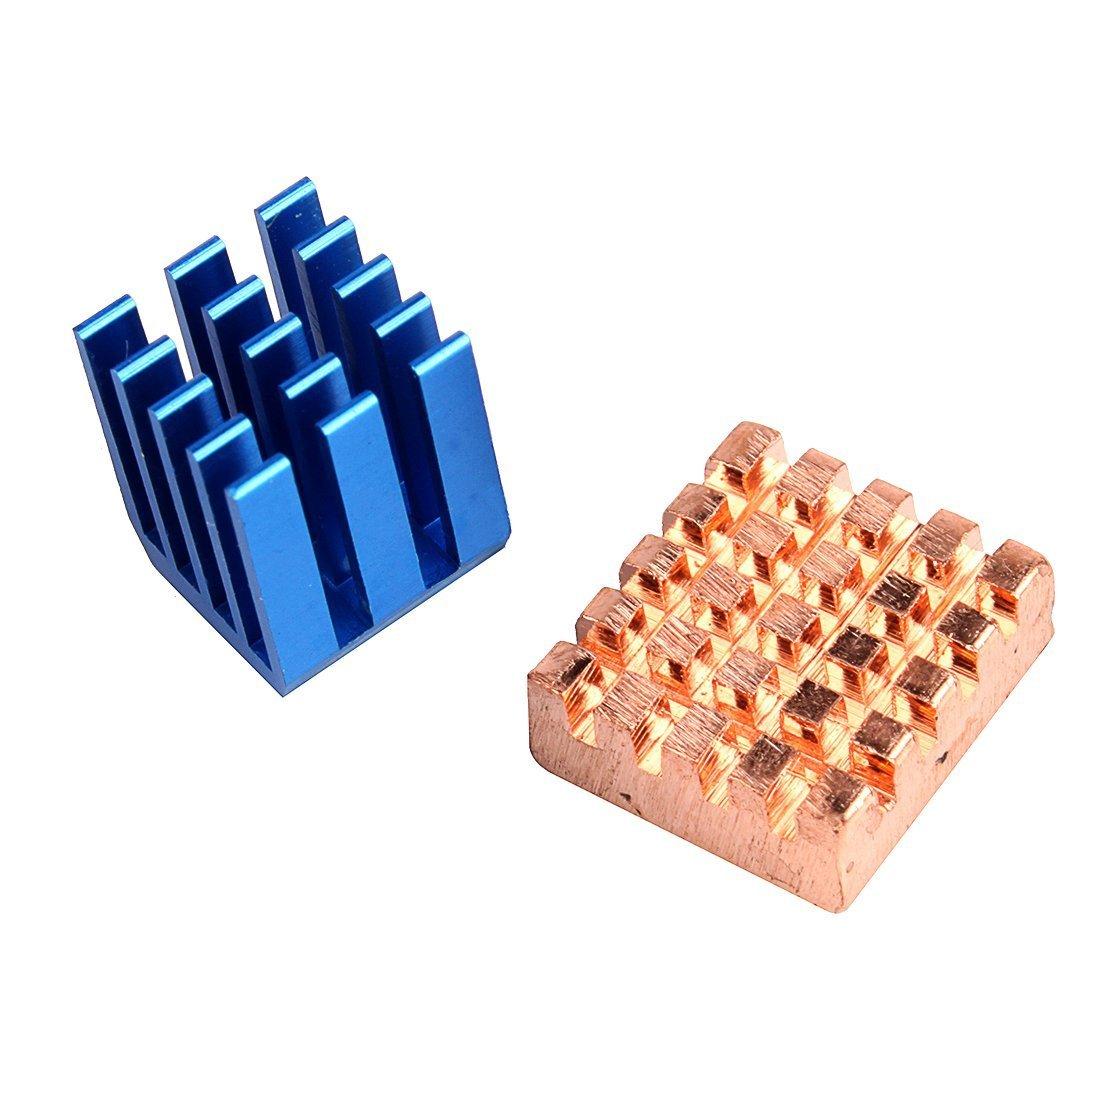 Makerfire 2pcs RPI Copper Aluminium Cooling Heatsink for Raspberry Pi B+ Raspberry Pi 2